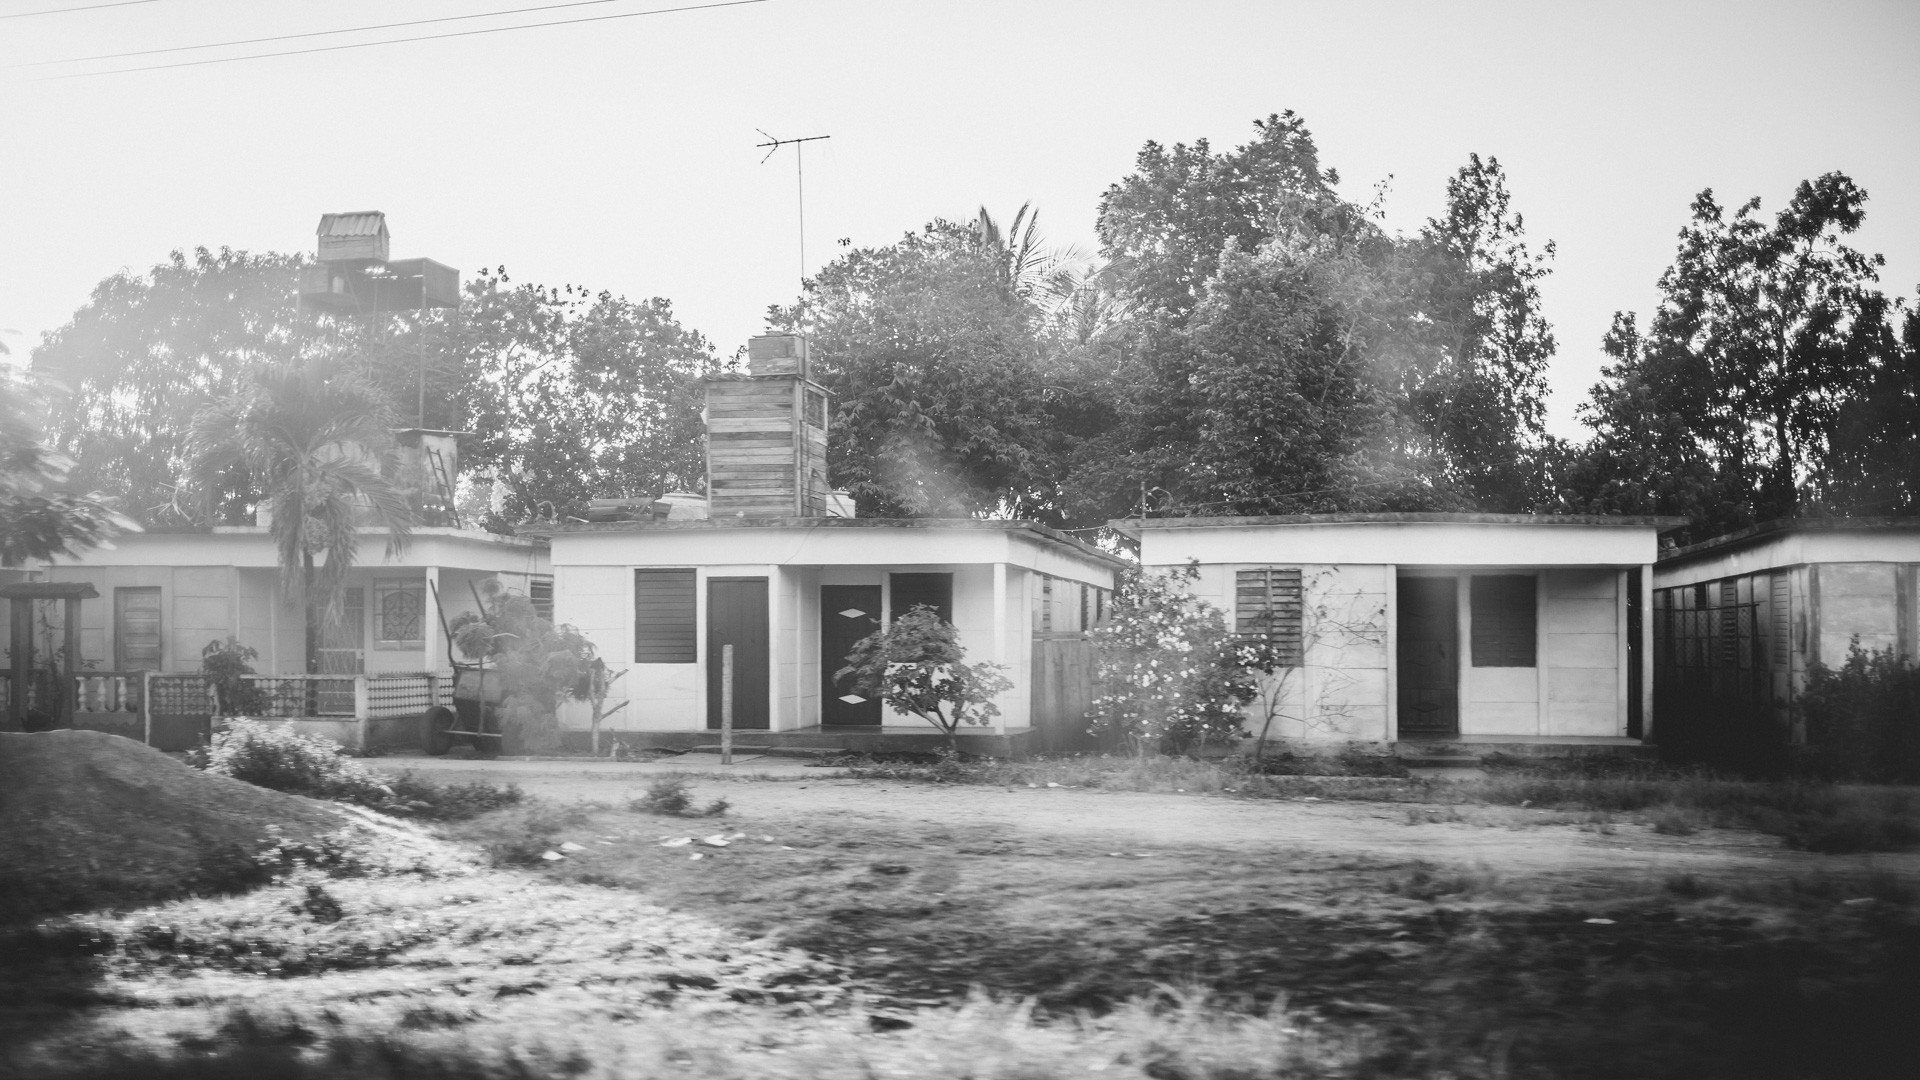 Damien-Dohmen-Photographe-Cuba-24